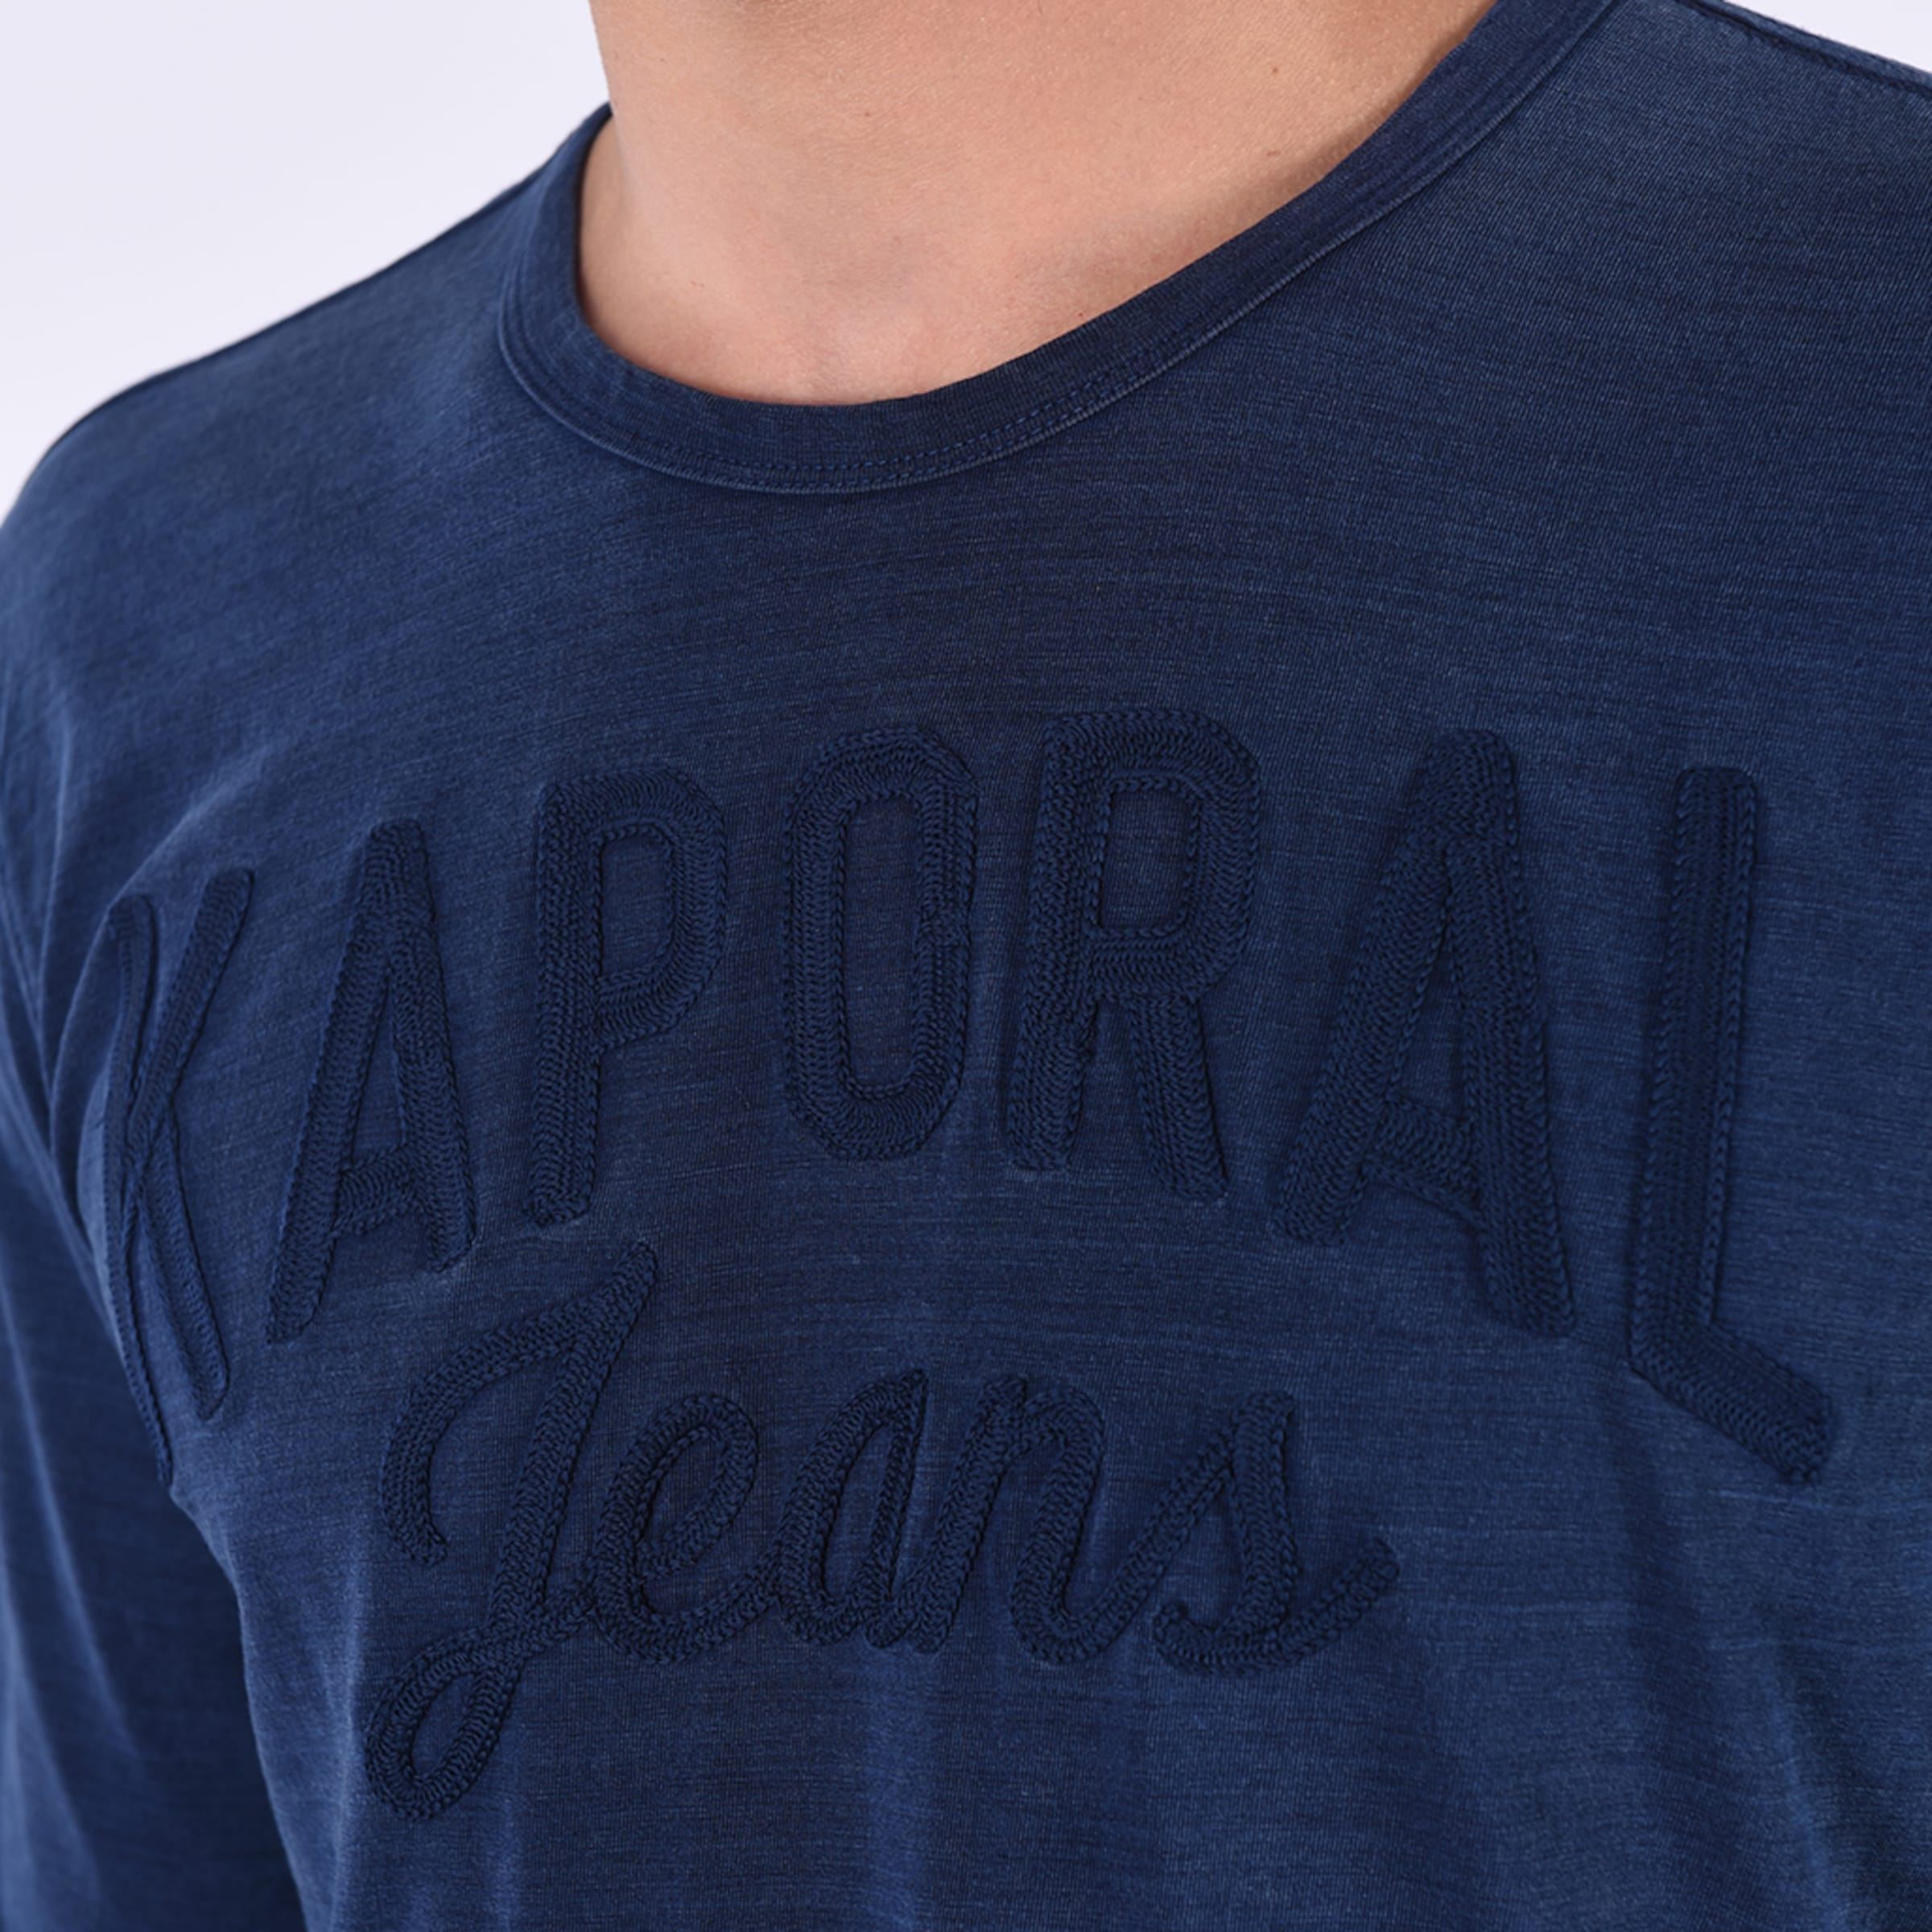 'bango' Kaporal 'bango' Shirt In Blaumeliert 'bango' In Blaumeliert Kaporal Shirt Shirt Kaporal xhdsrtQC